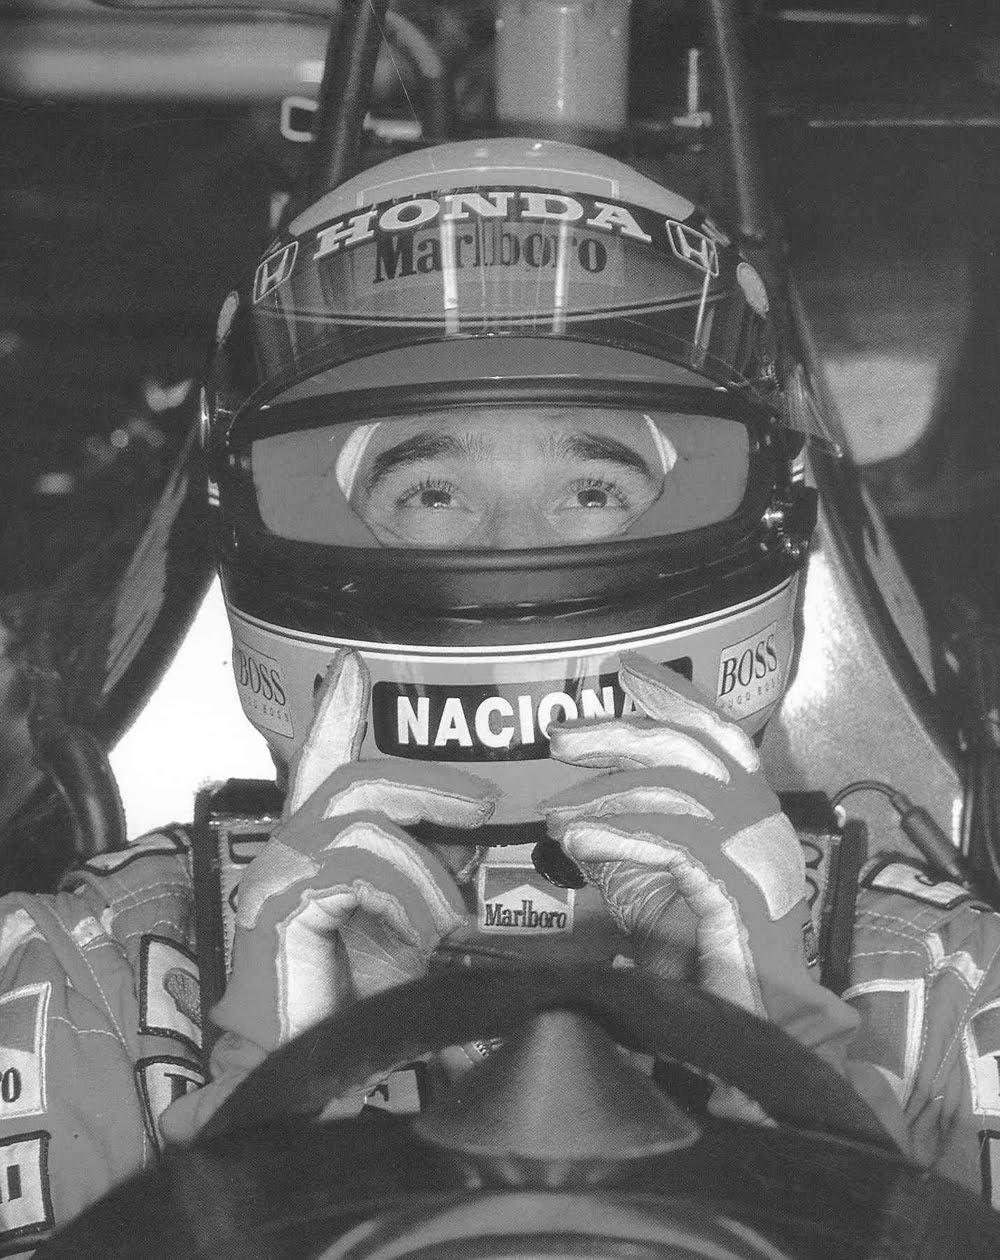 an analysis of the fatal accident of ayrton senna in the formula 1 world championship Formula 1 history and statistics drivers,  ayrton senna (3) michael schumacher, kimi raikkonen (2)  1 mercedes championship points: 34700 2.